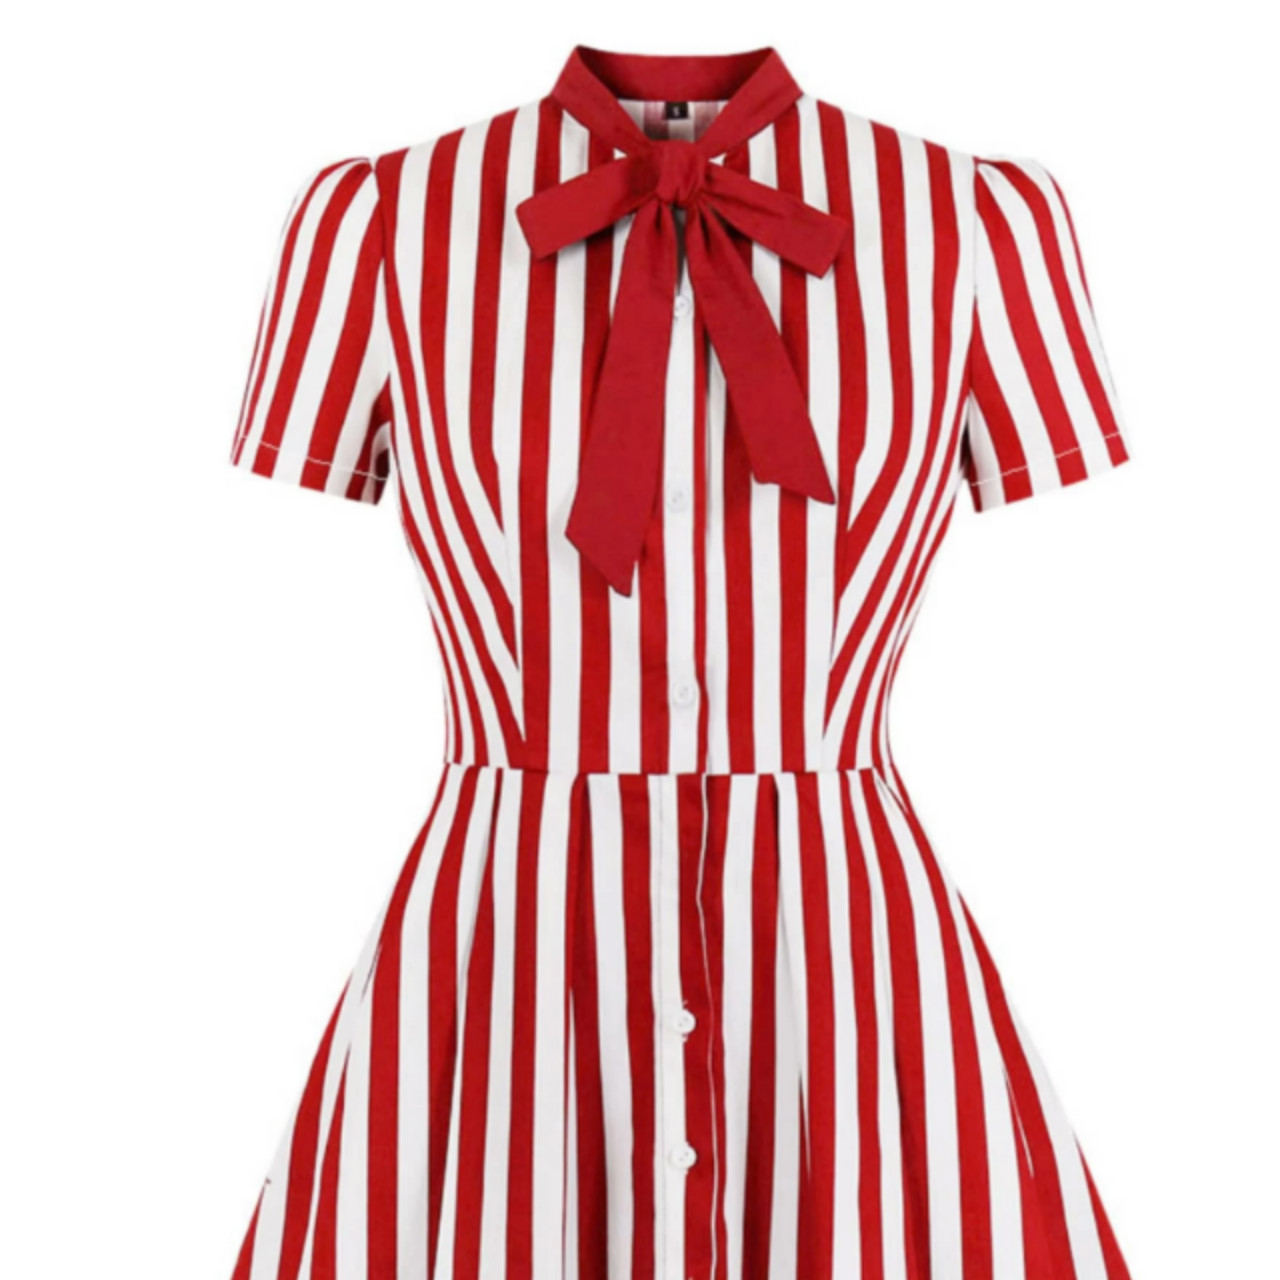 Plus tie neck stripe fit & flare dress 4xl